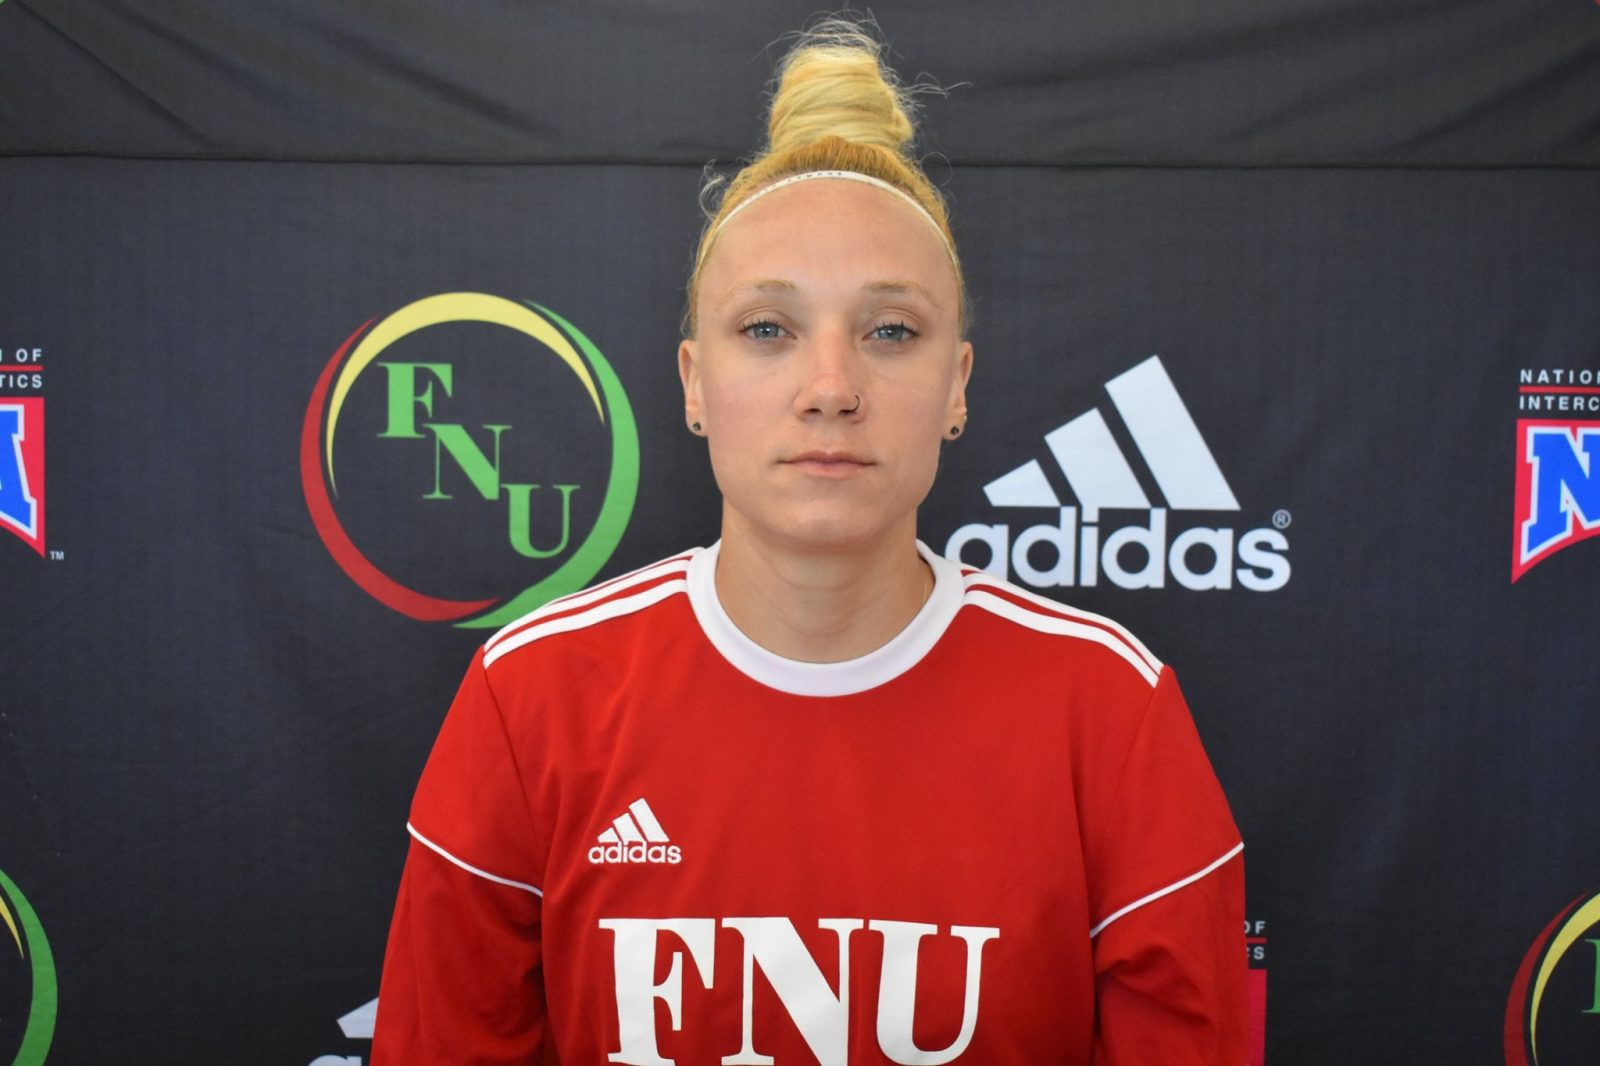 FNU Women's soccer player Jurema Borini